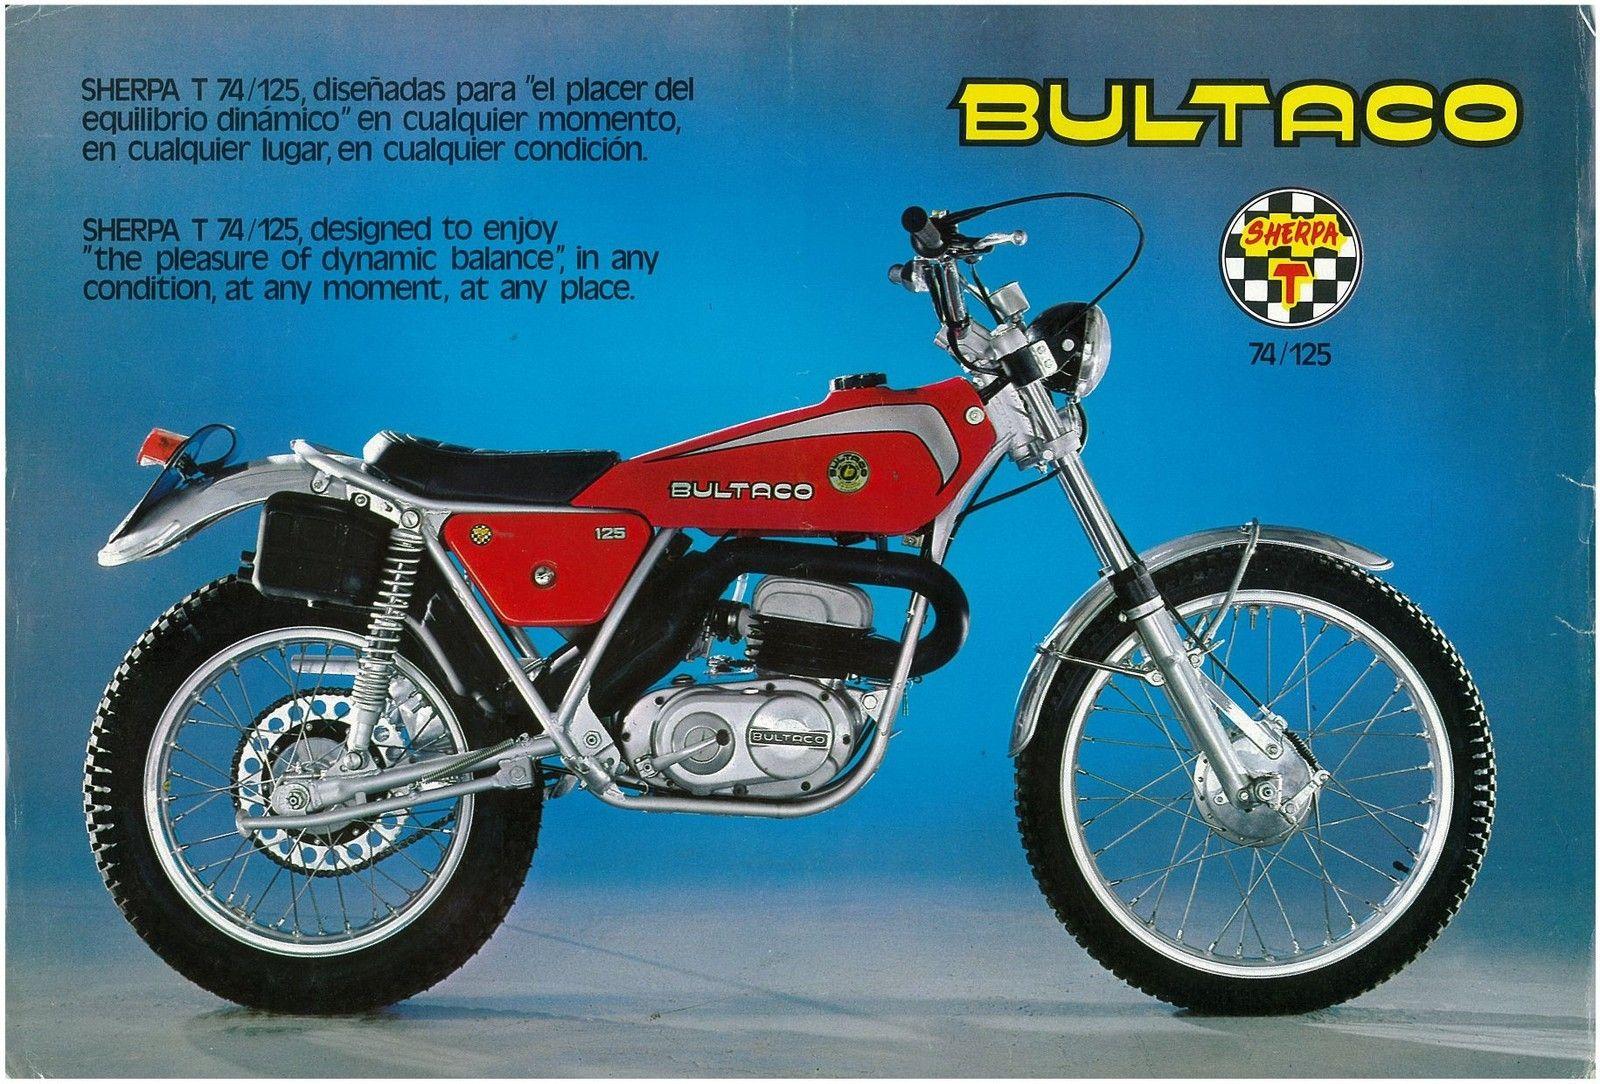 Bultaco Brochure Sherpa T 74 125 Model 184 Trials 1976 1977 1978 Sales Catalog Repro | eBay